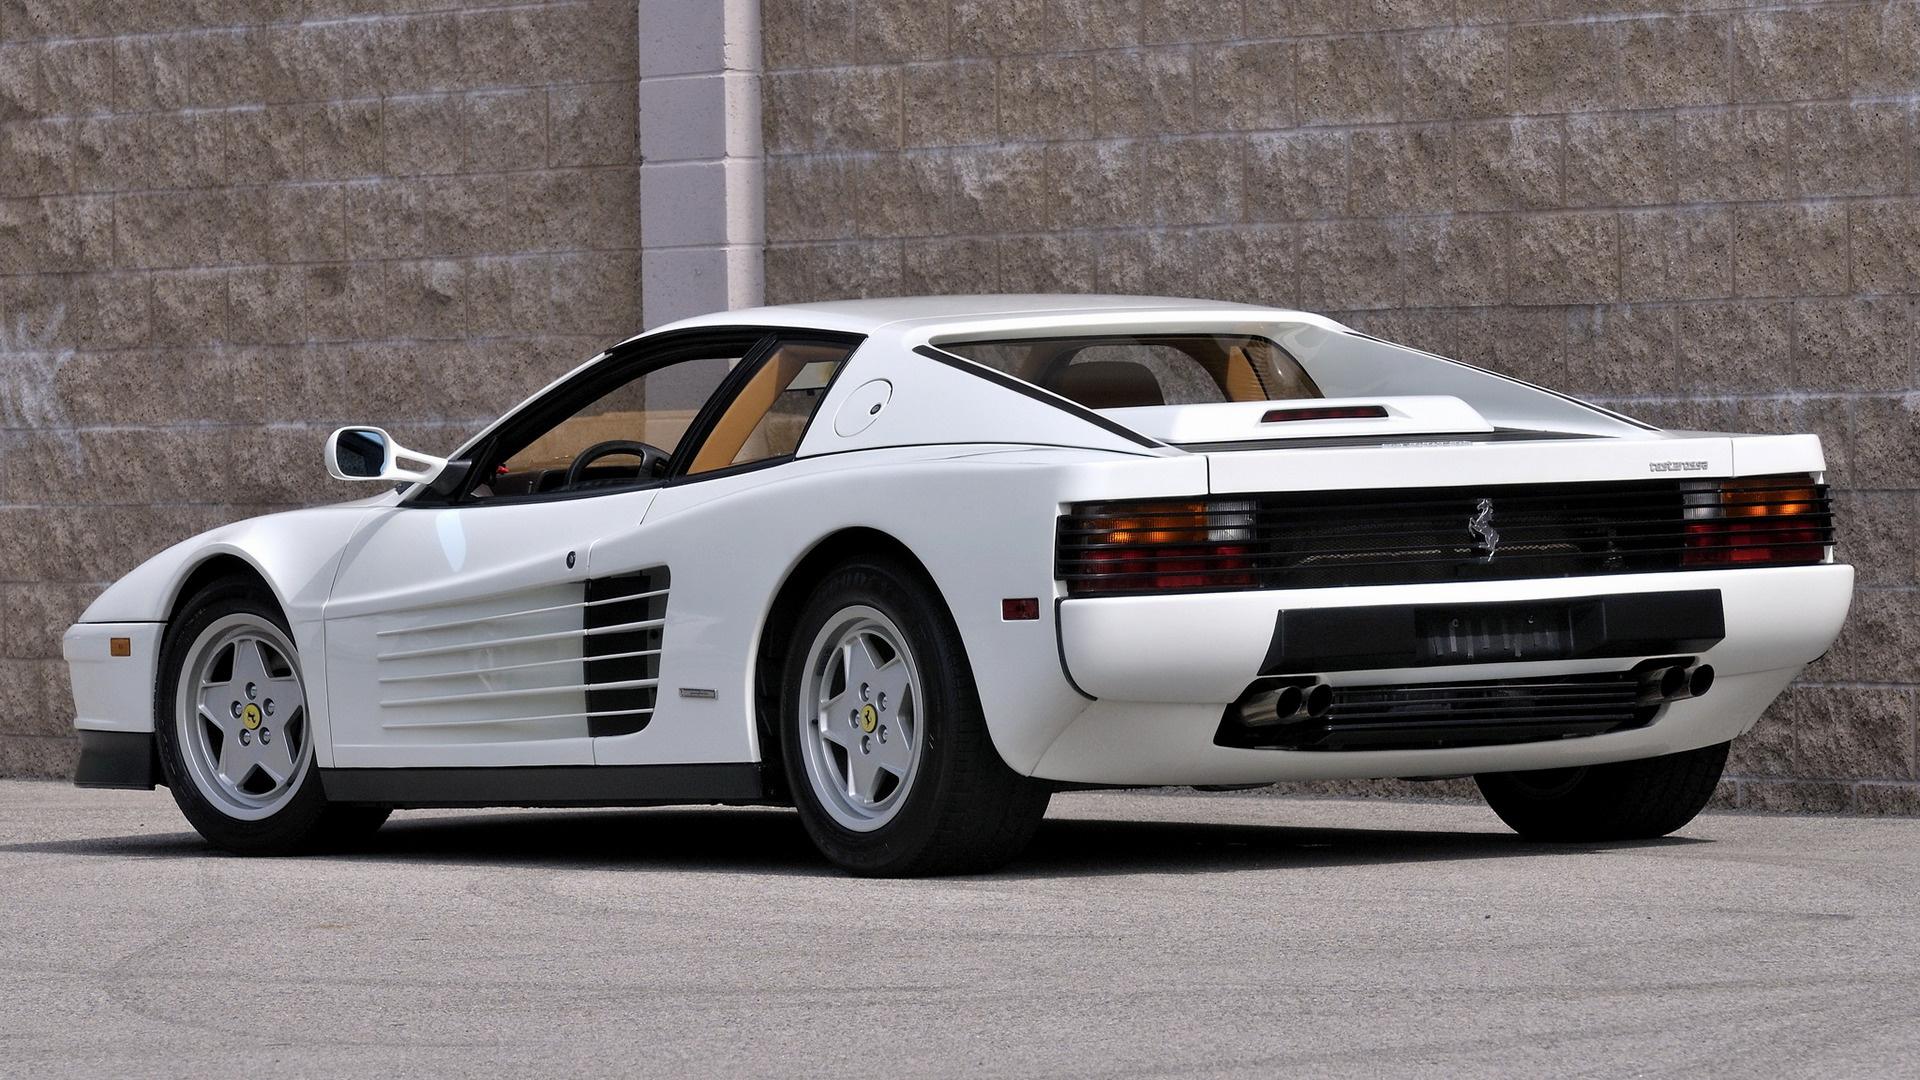 Car Ferrari Testarossa Old Car Sport Car White Car Wallpaper Resolution 1920x1080 Id 1149245 Wallha Com